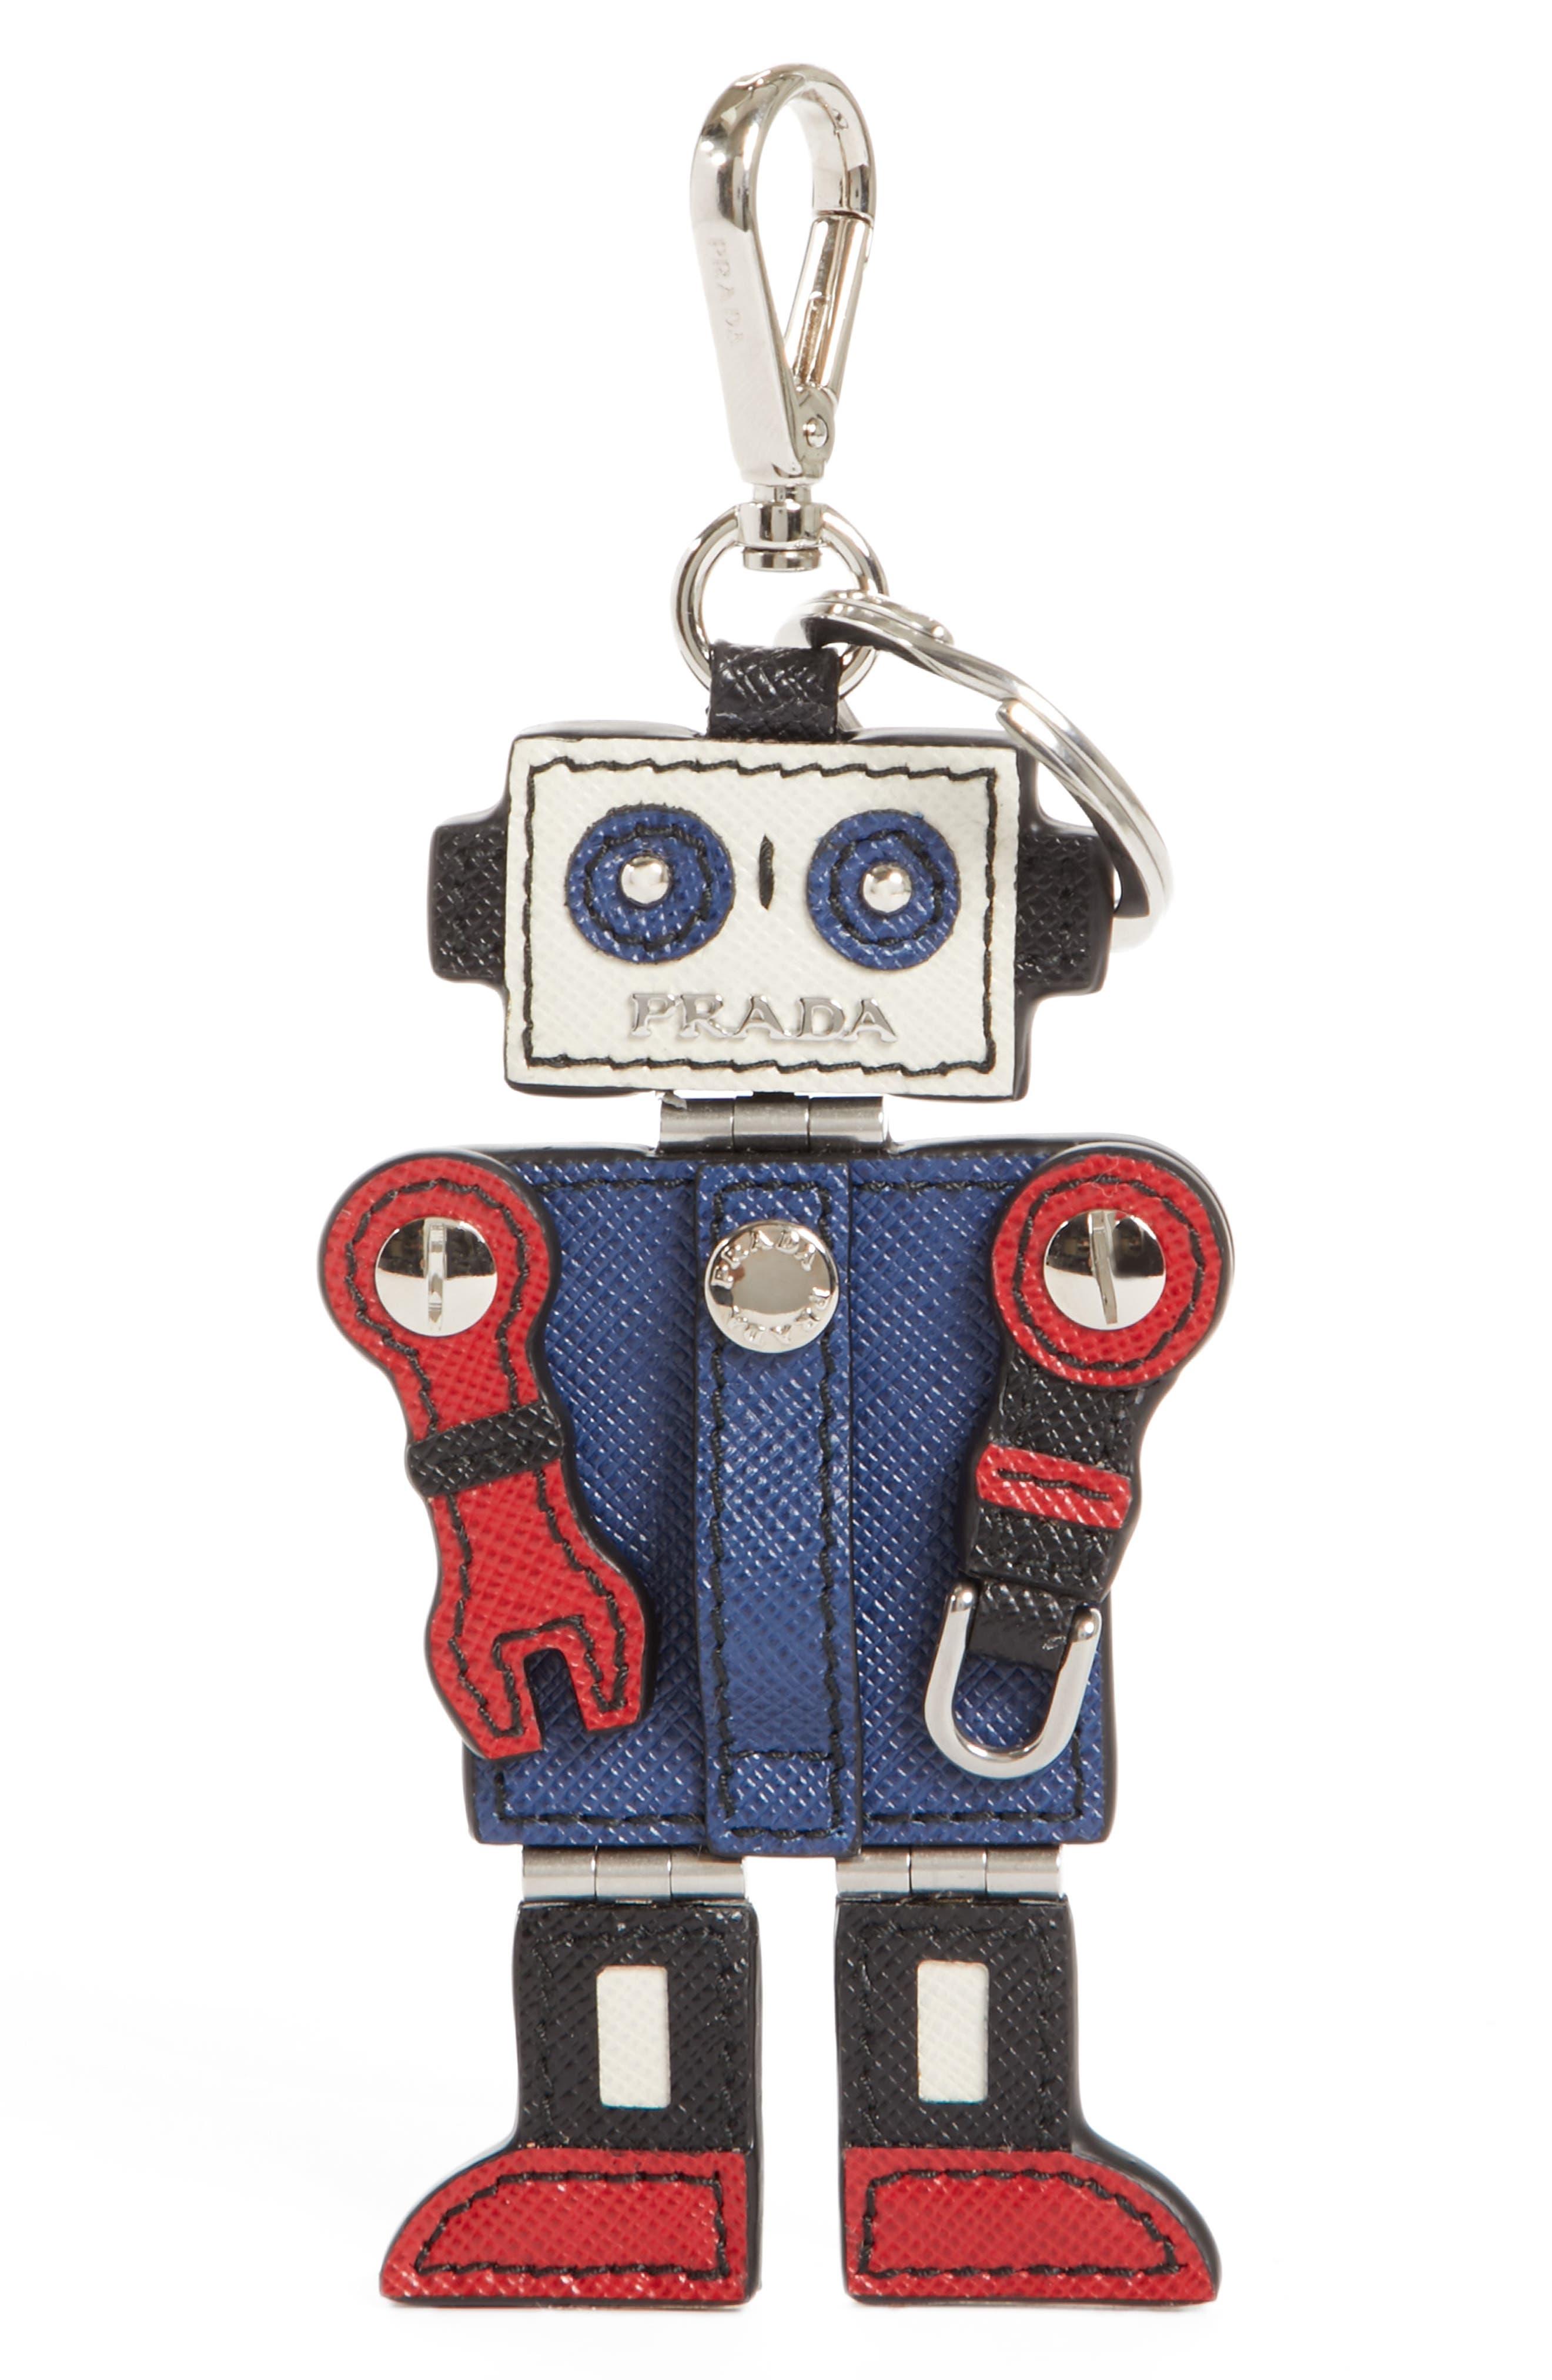 Saffiano Robot Keychain,                             Main thumbnail 1, color,                             920